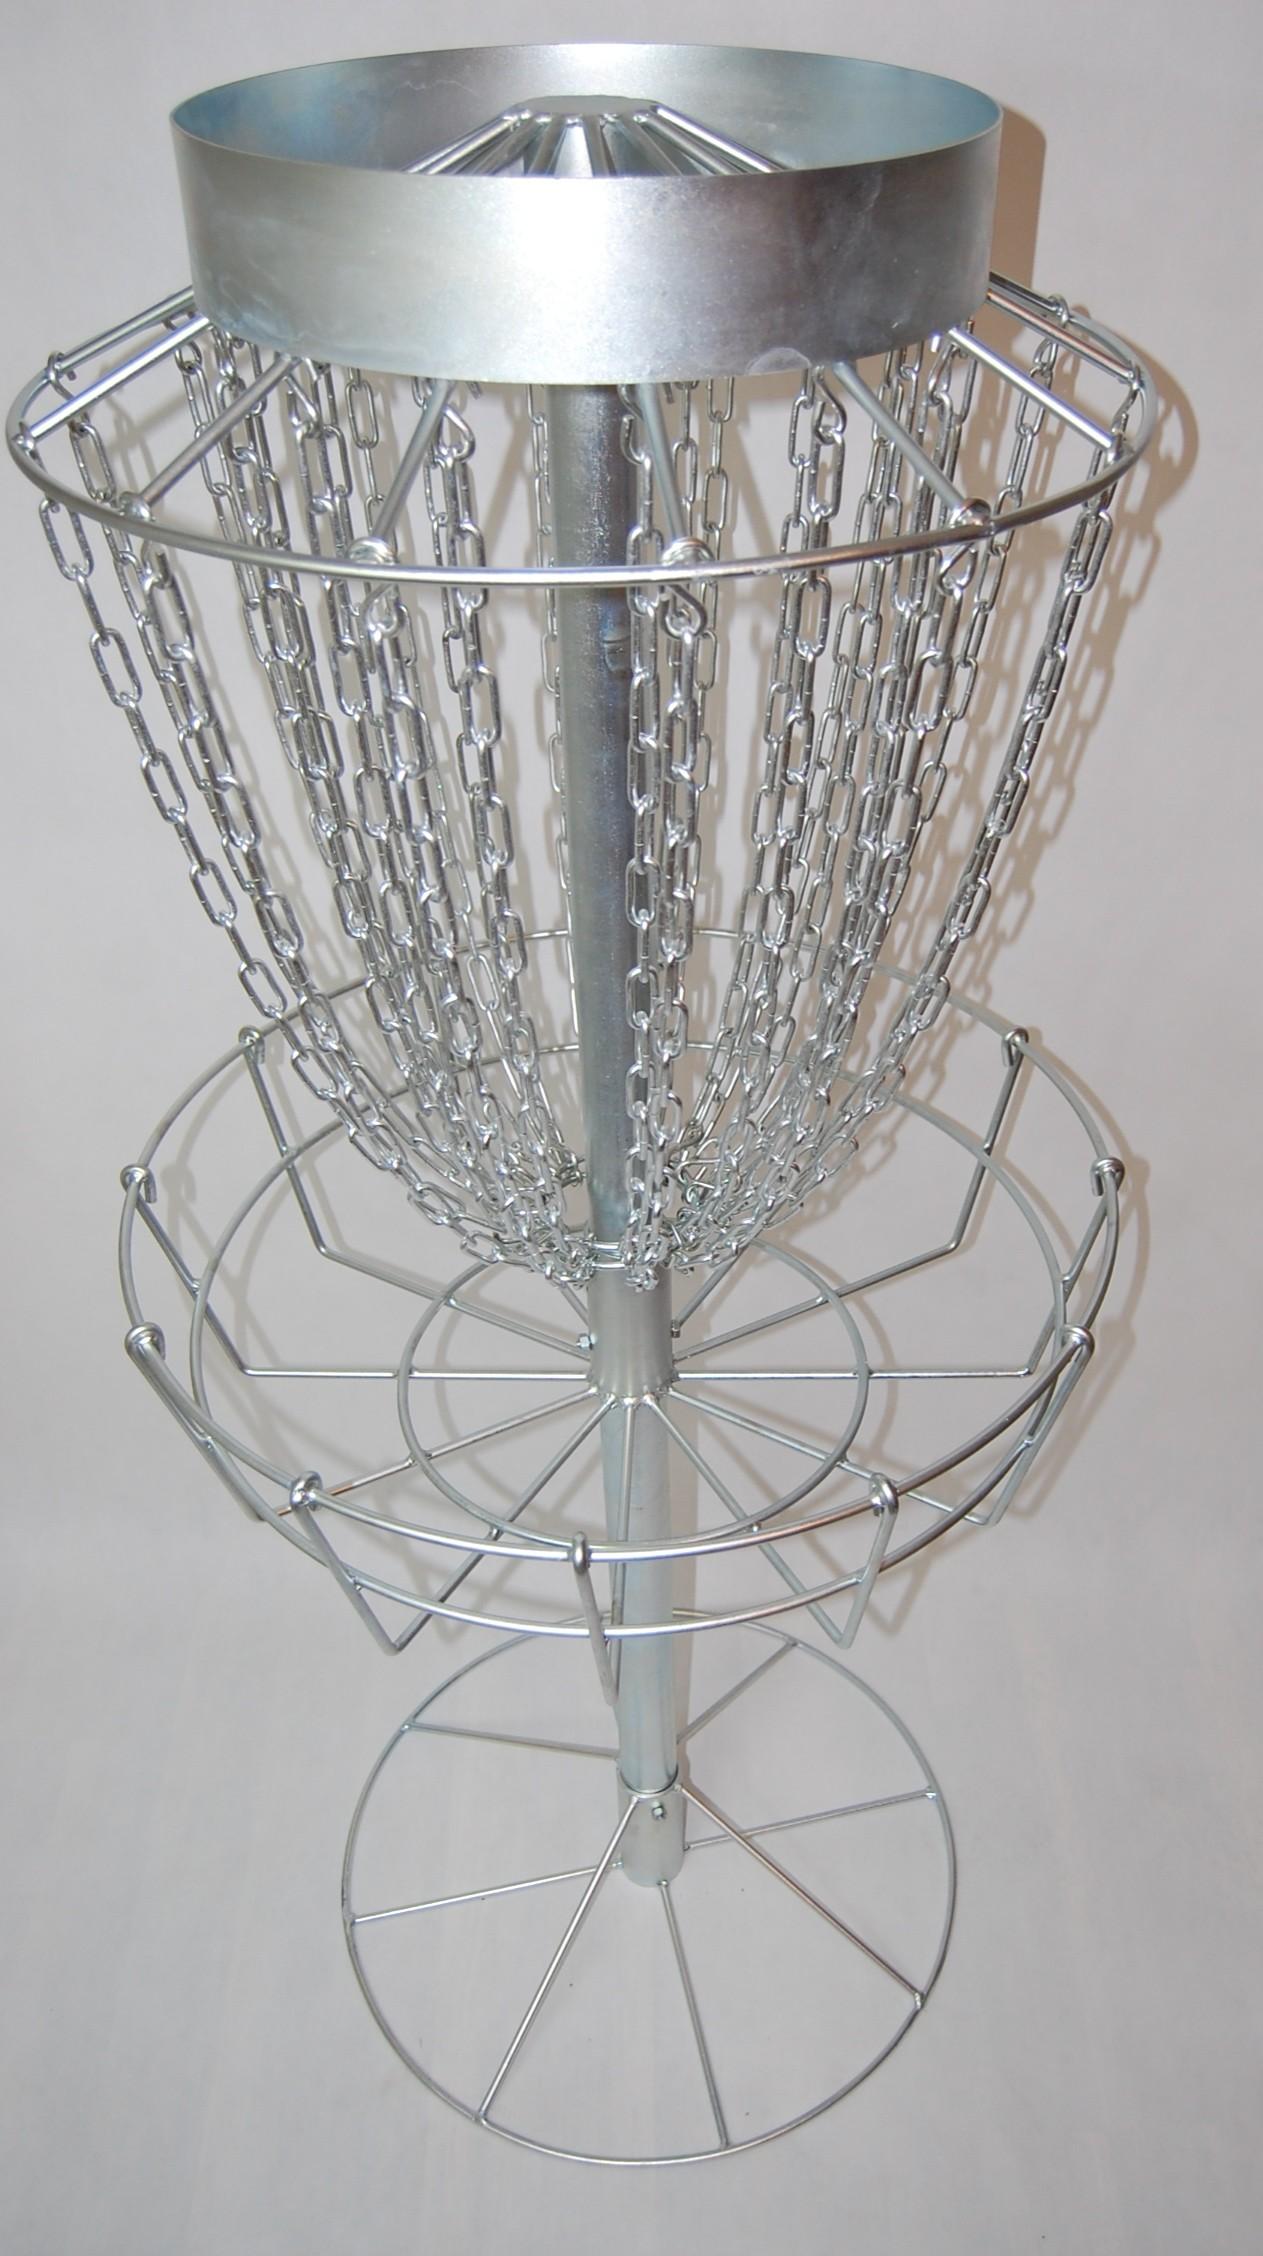 Cardinal Target (ocynk) disc golf